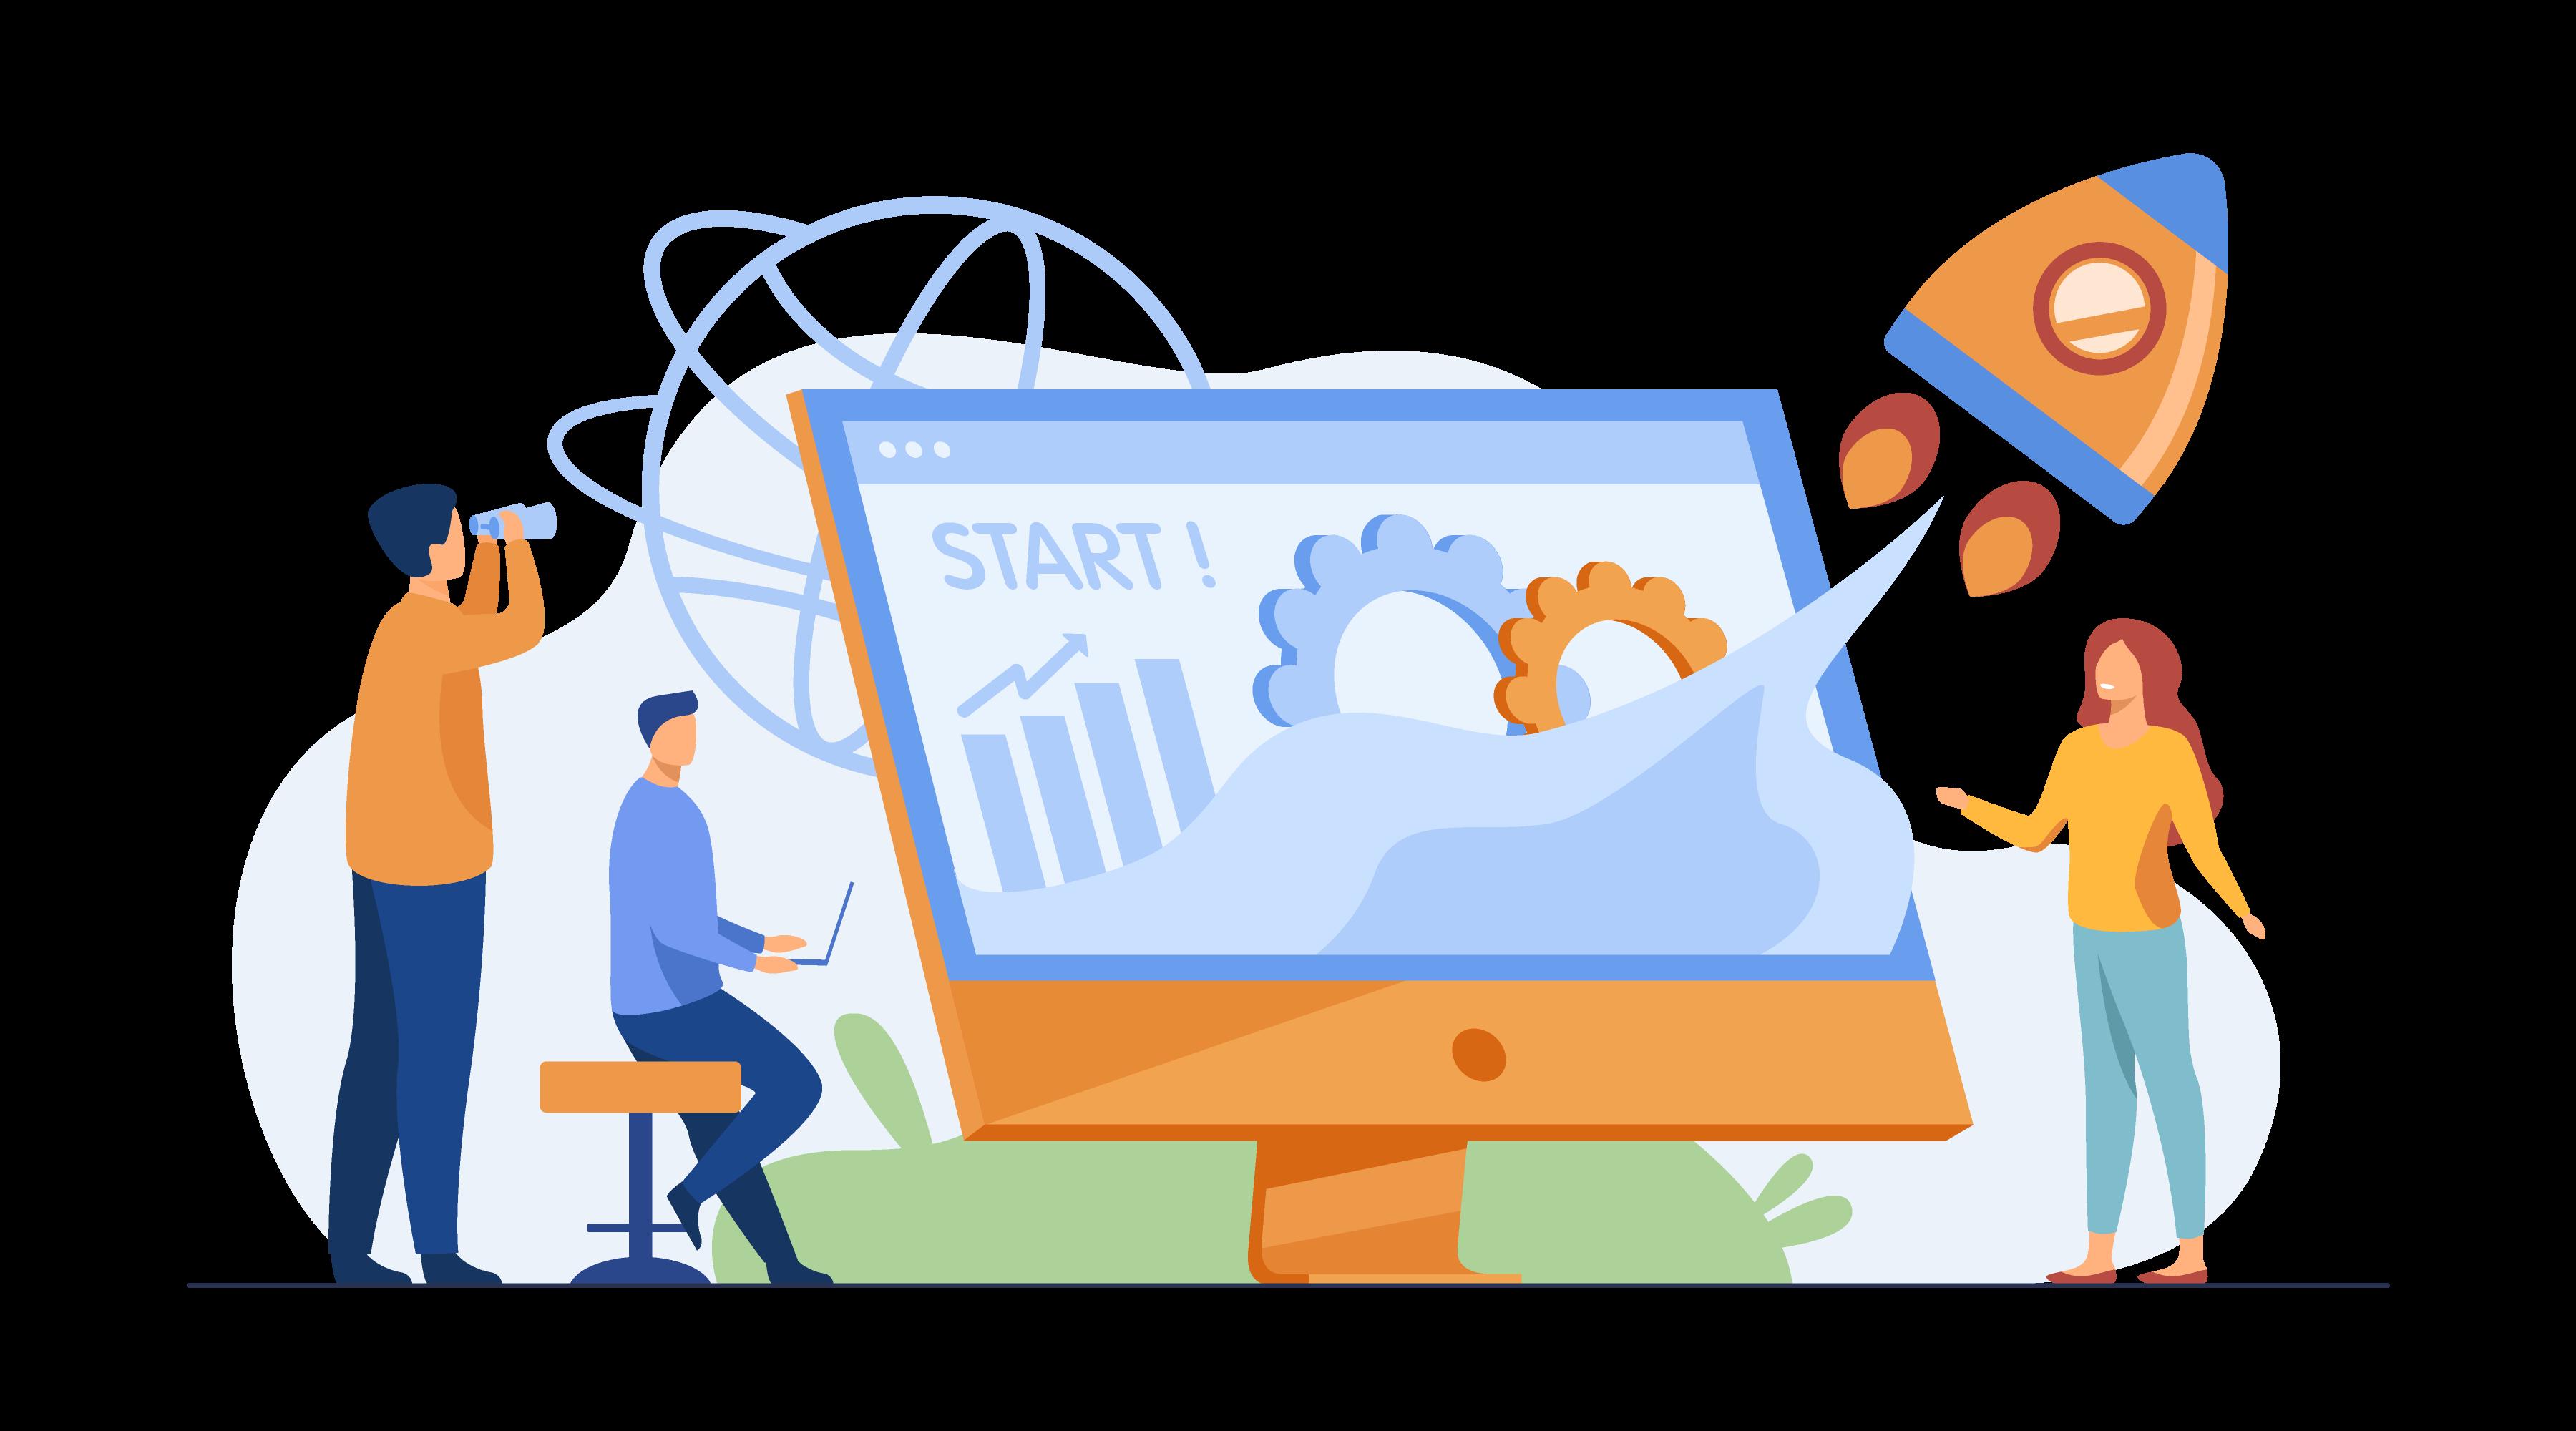 Digitales Wissensmanagement steigert die Effizienz der Belegschaft.